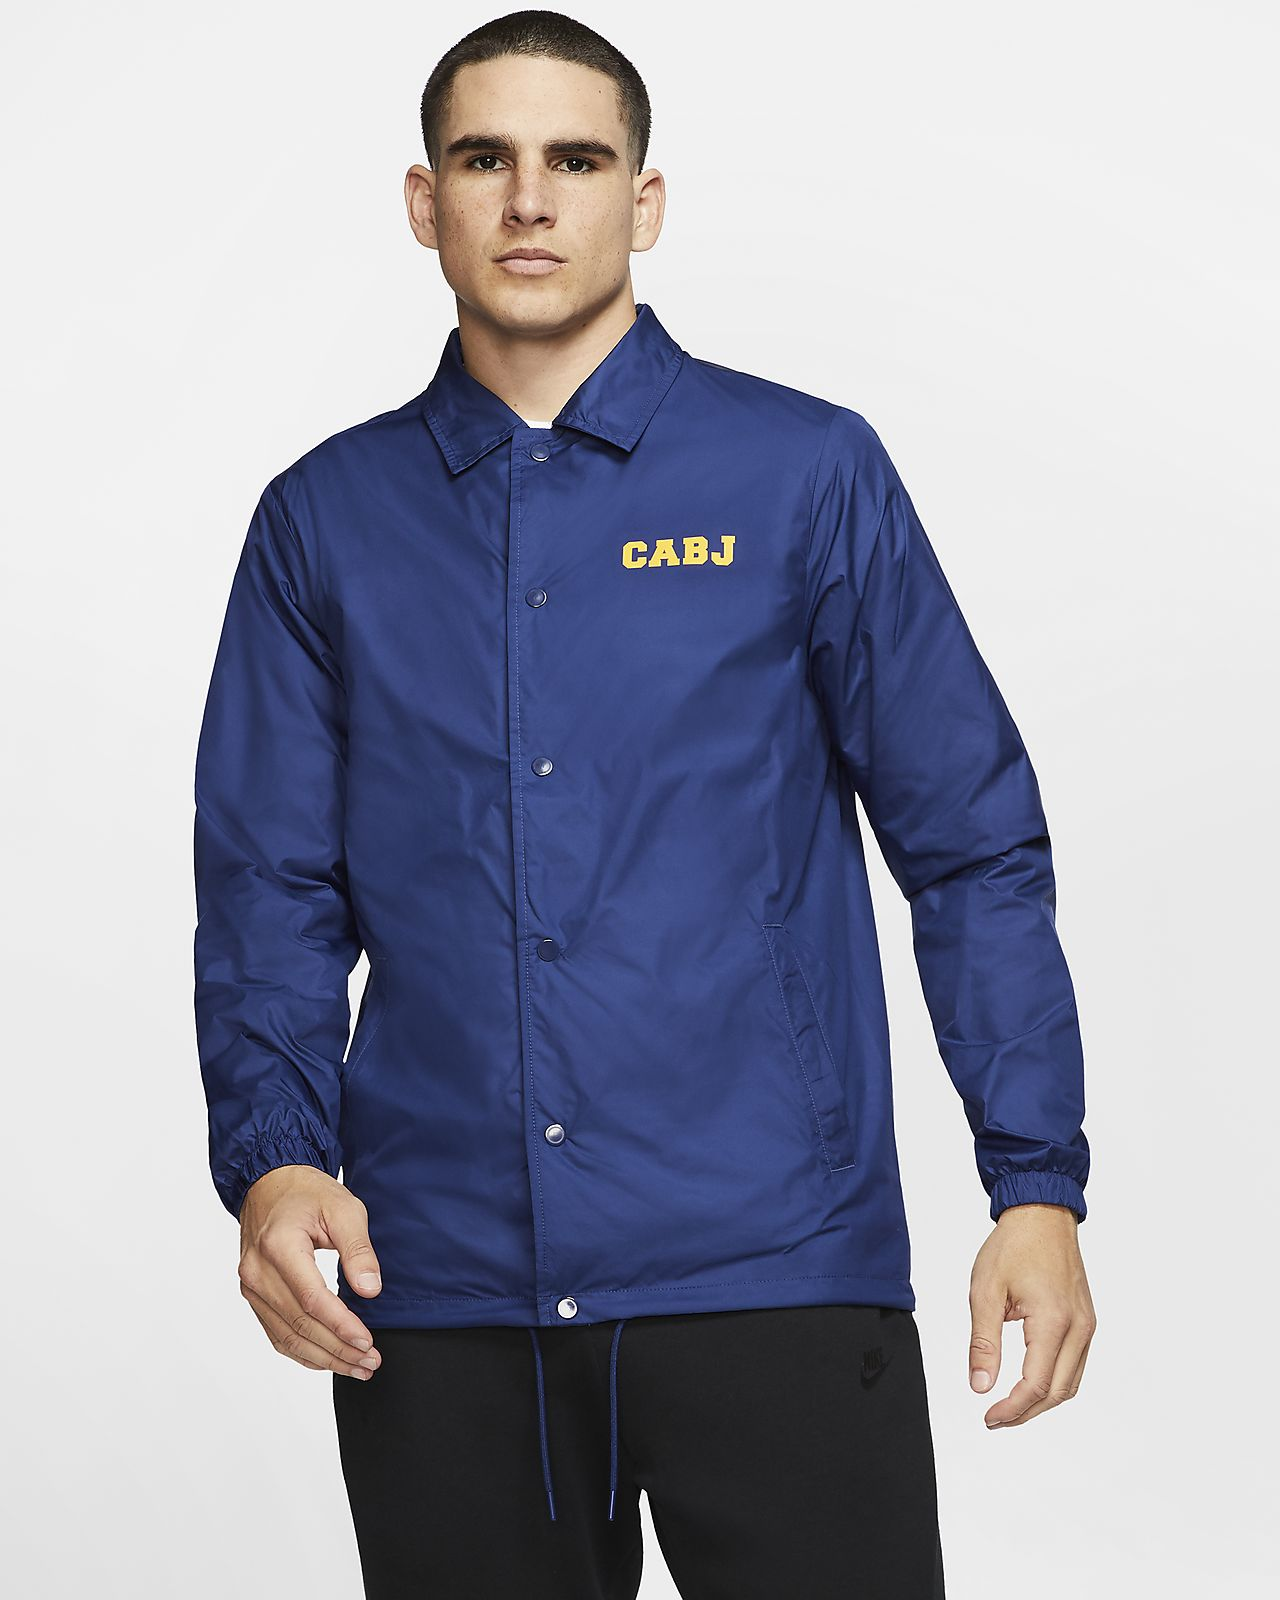 Nike Shield Boca Juniors Men's Jacket